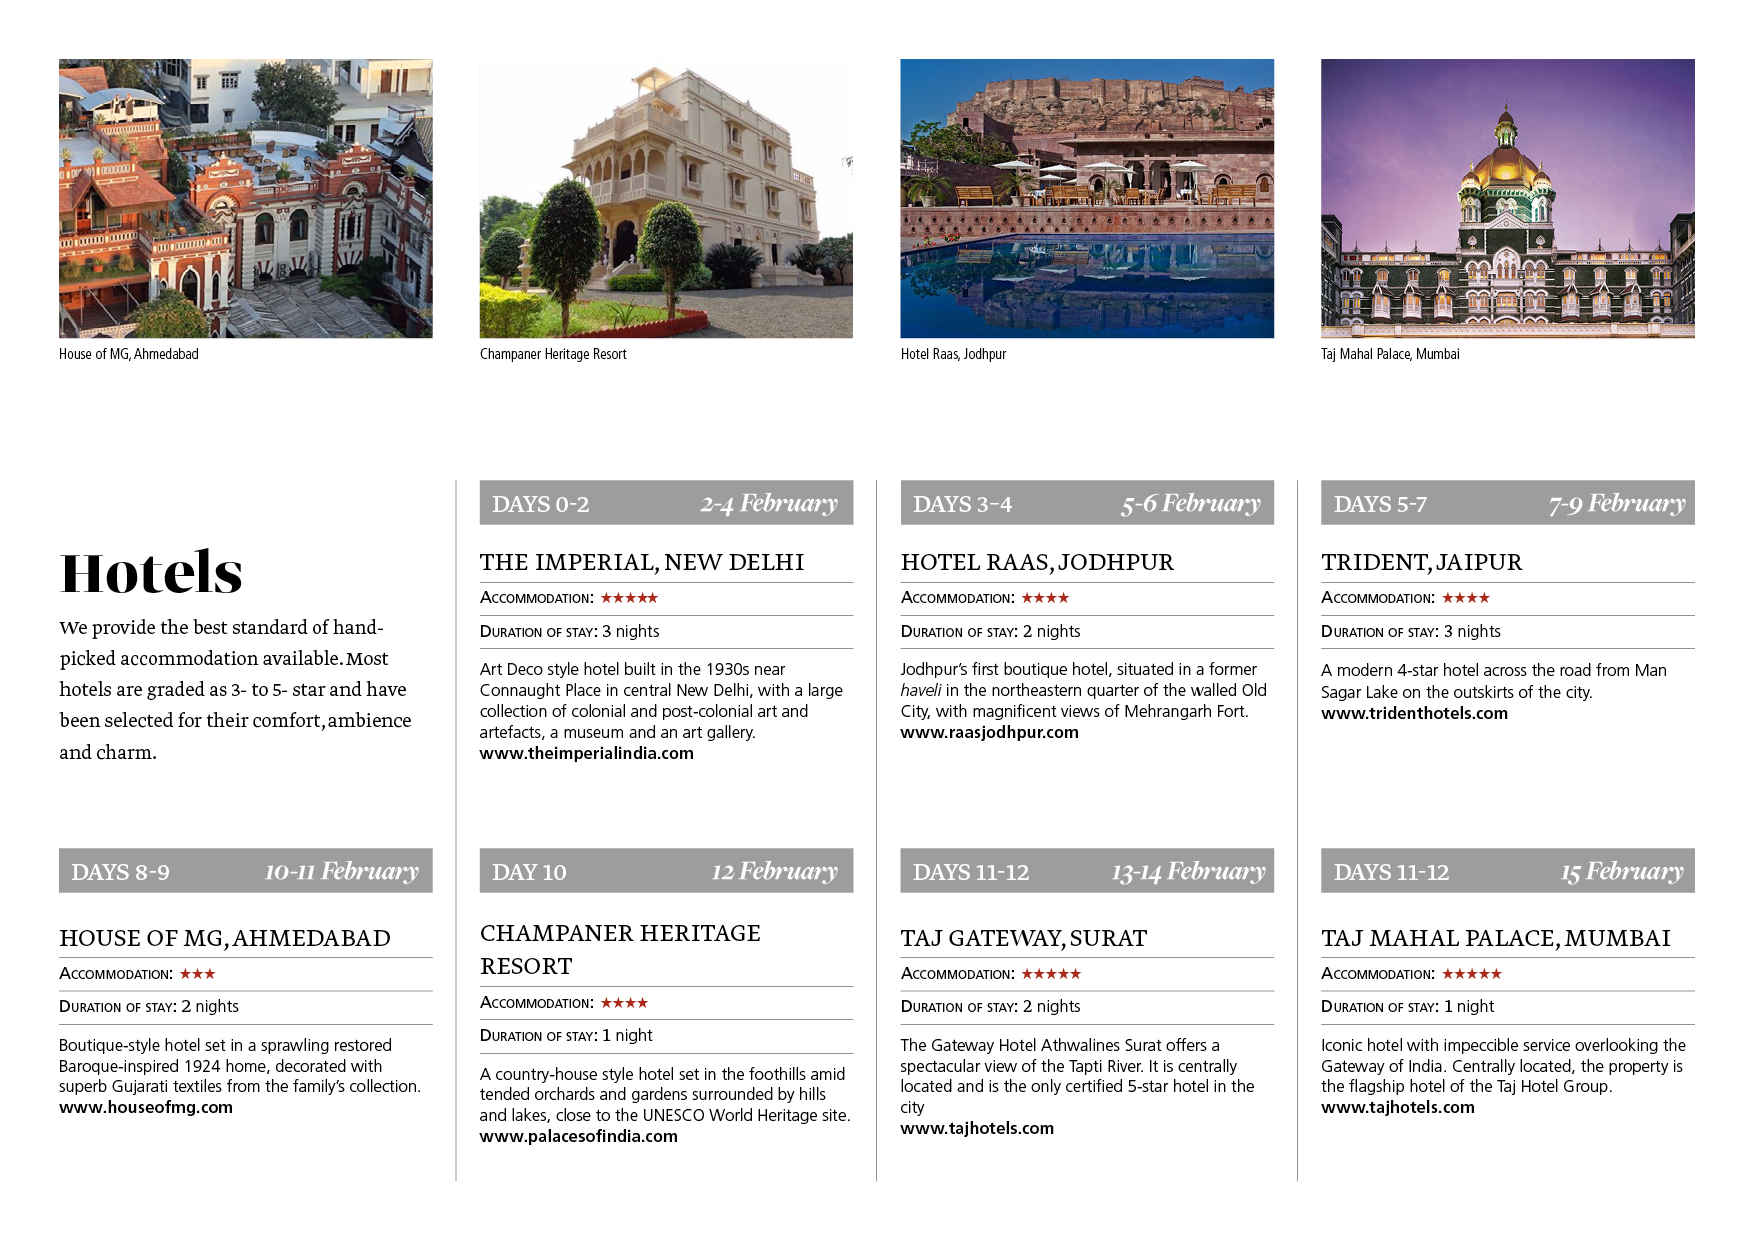 HALI_Tour_Brochure_India201810